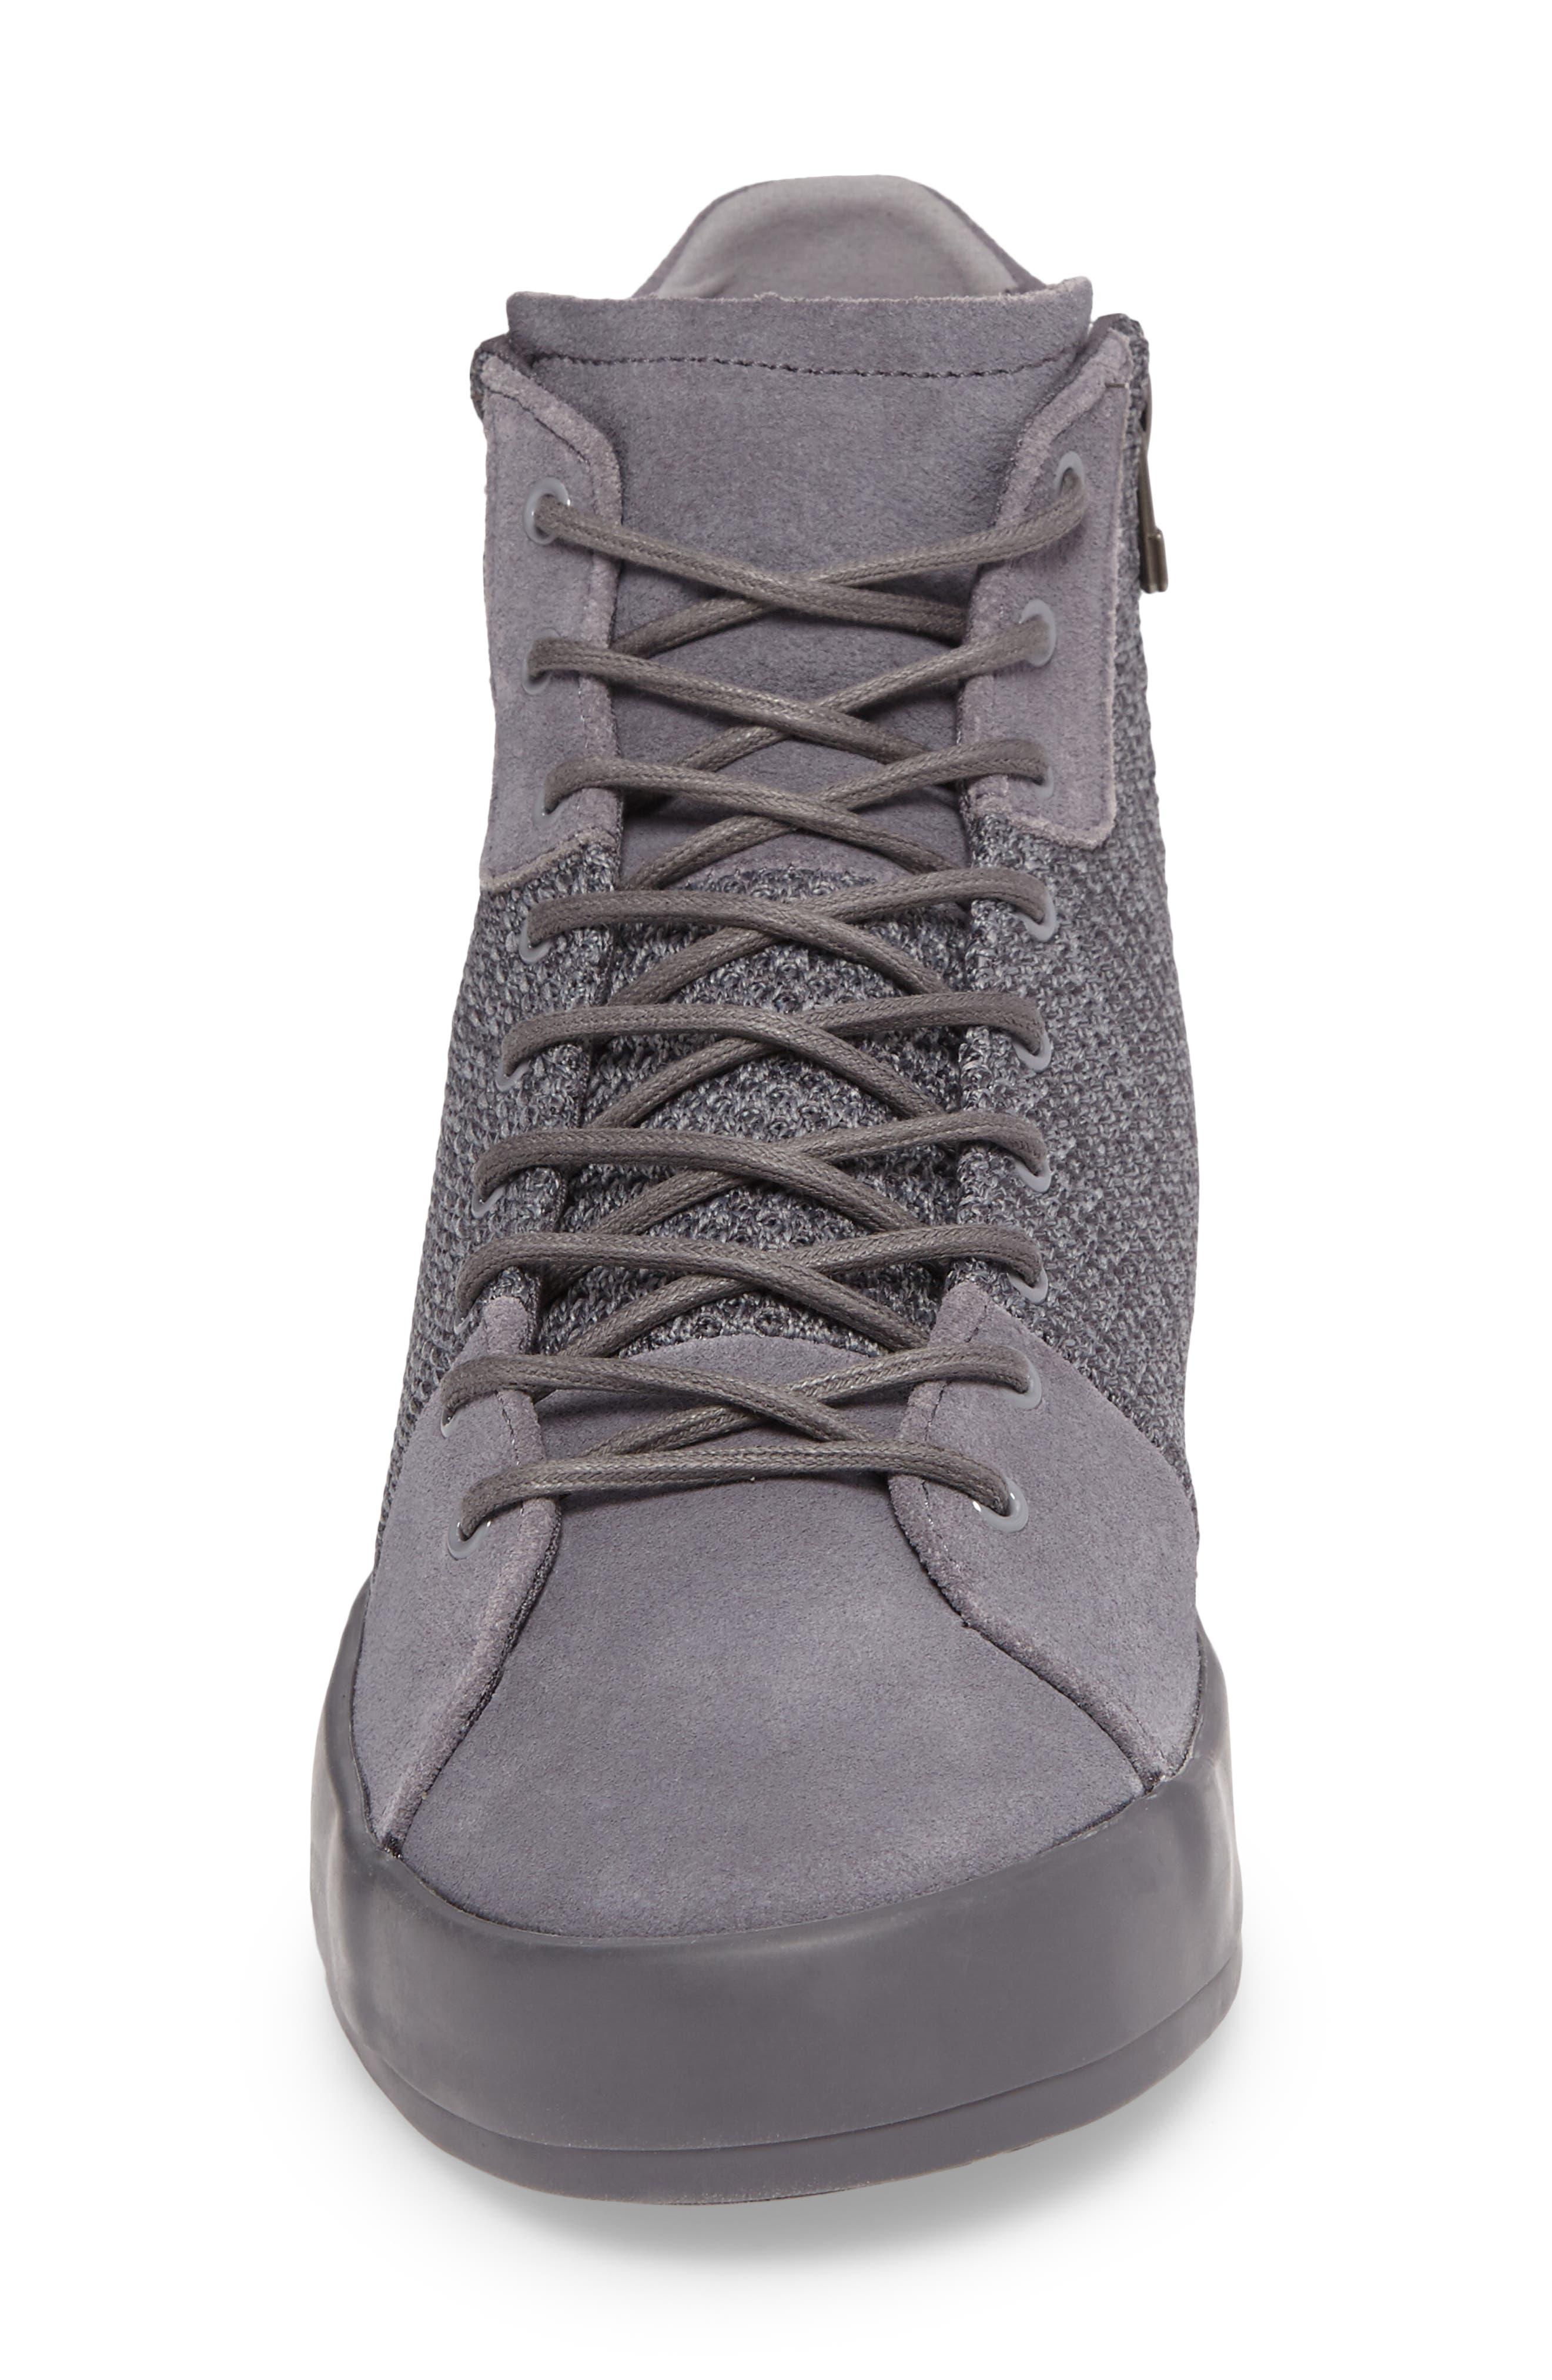 Carda Hi Sneaker,                             Alternate thumbnail 4, color,                             Smoke Leather